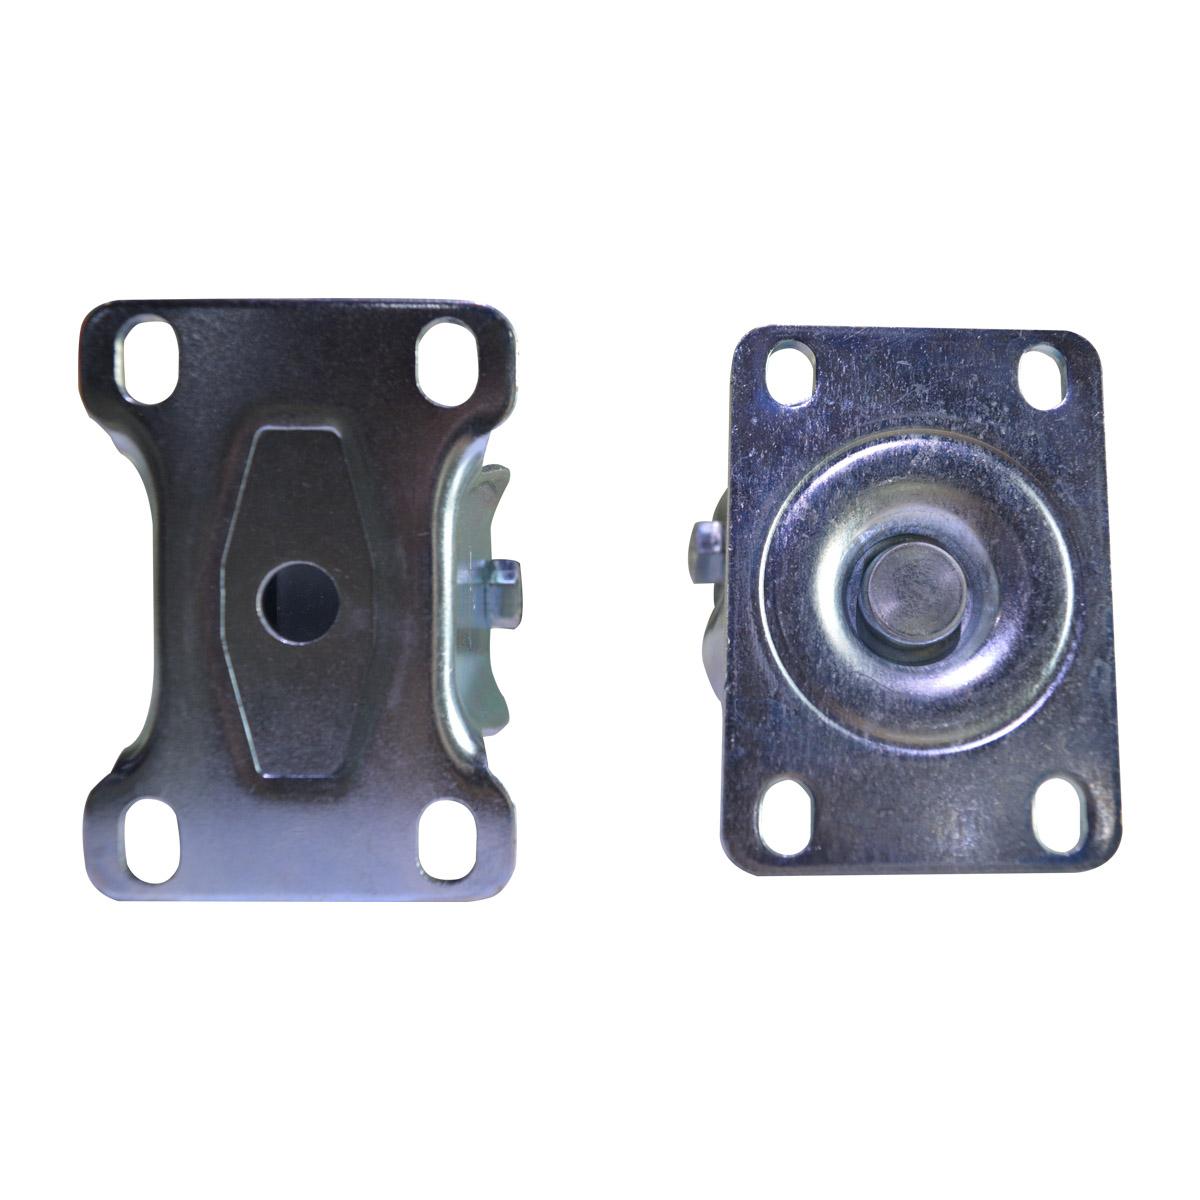 Caster Set (2 Swivel/2 Locking) for sale